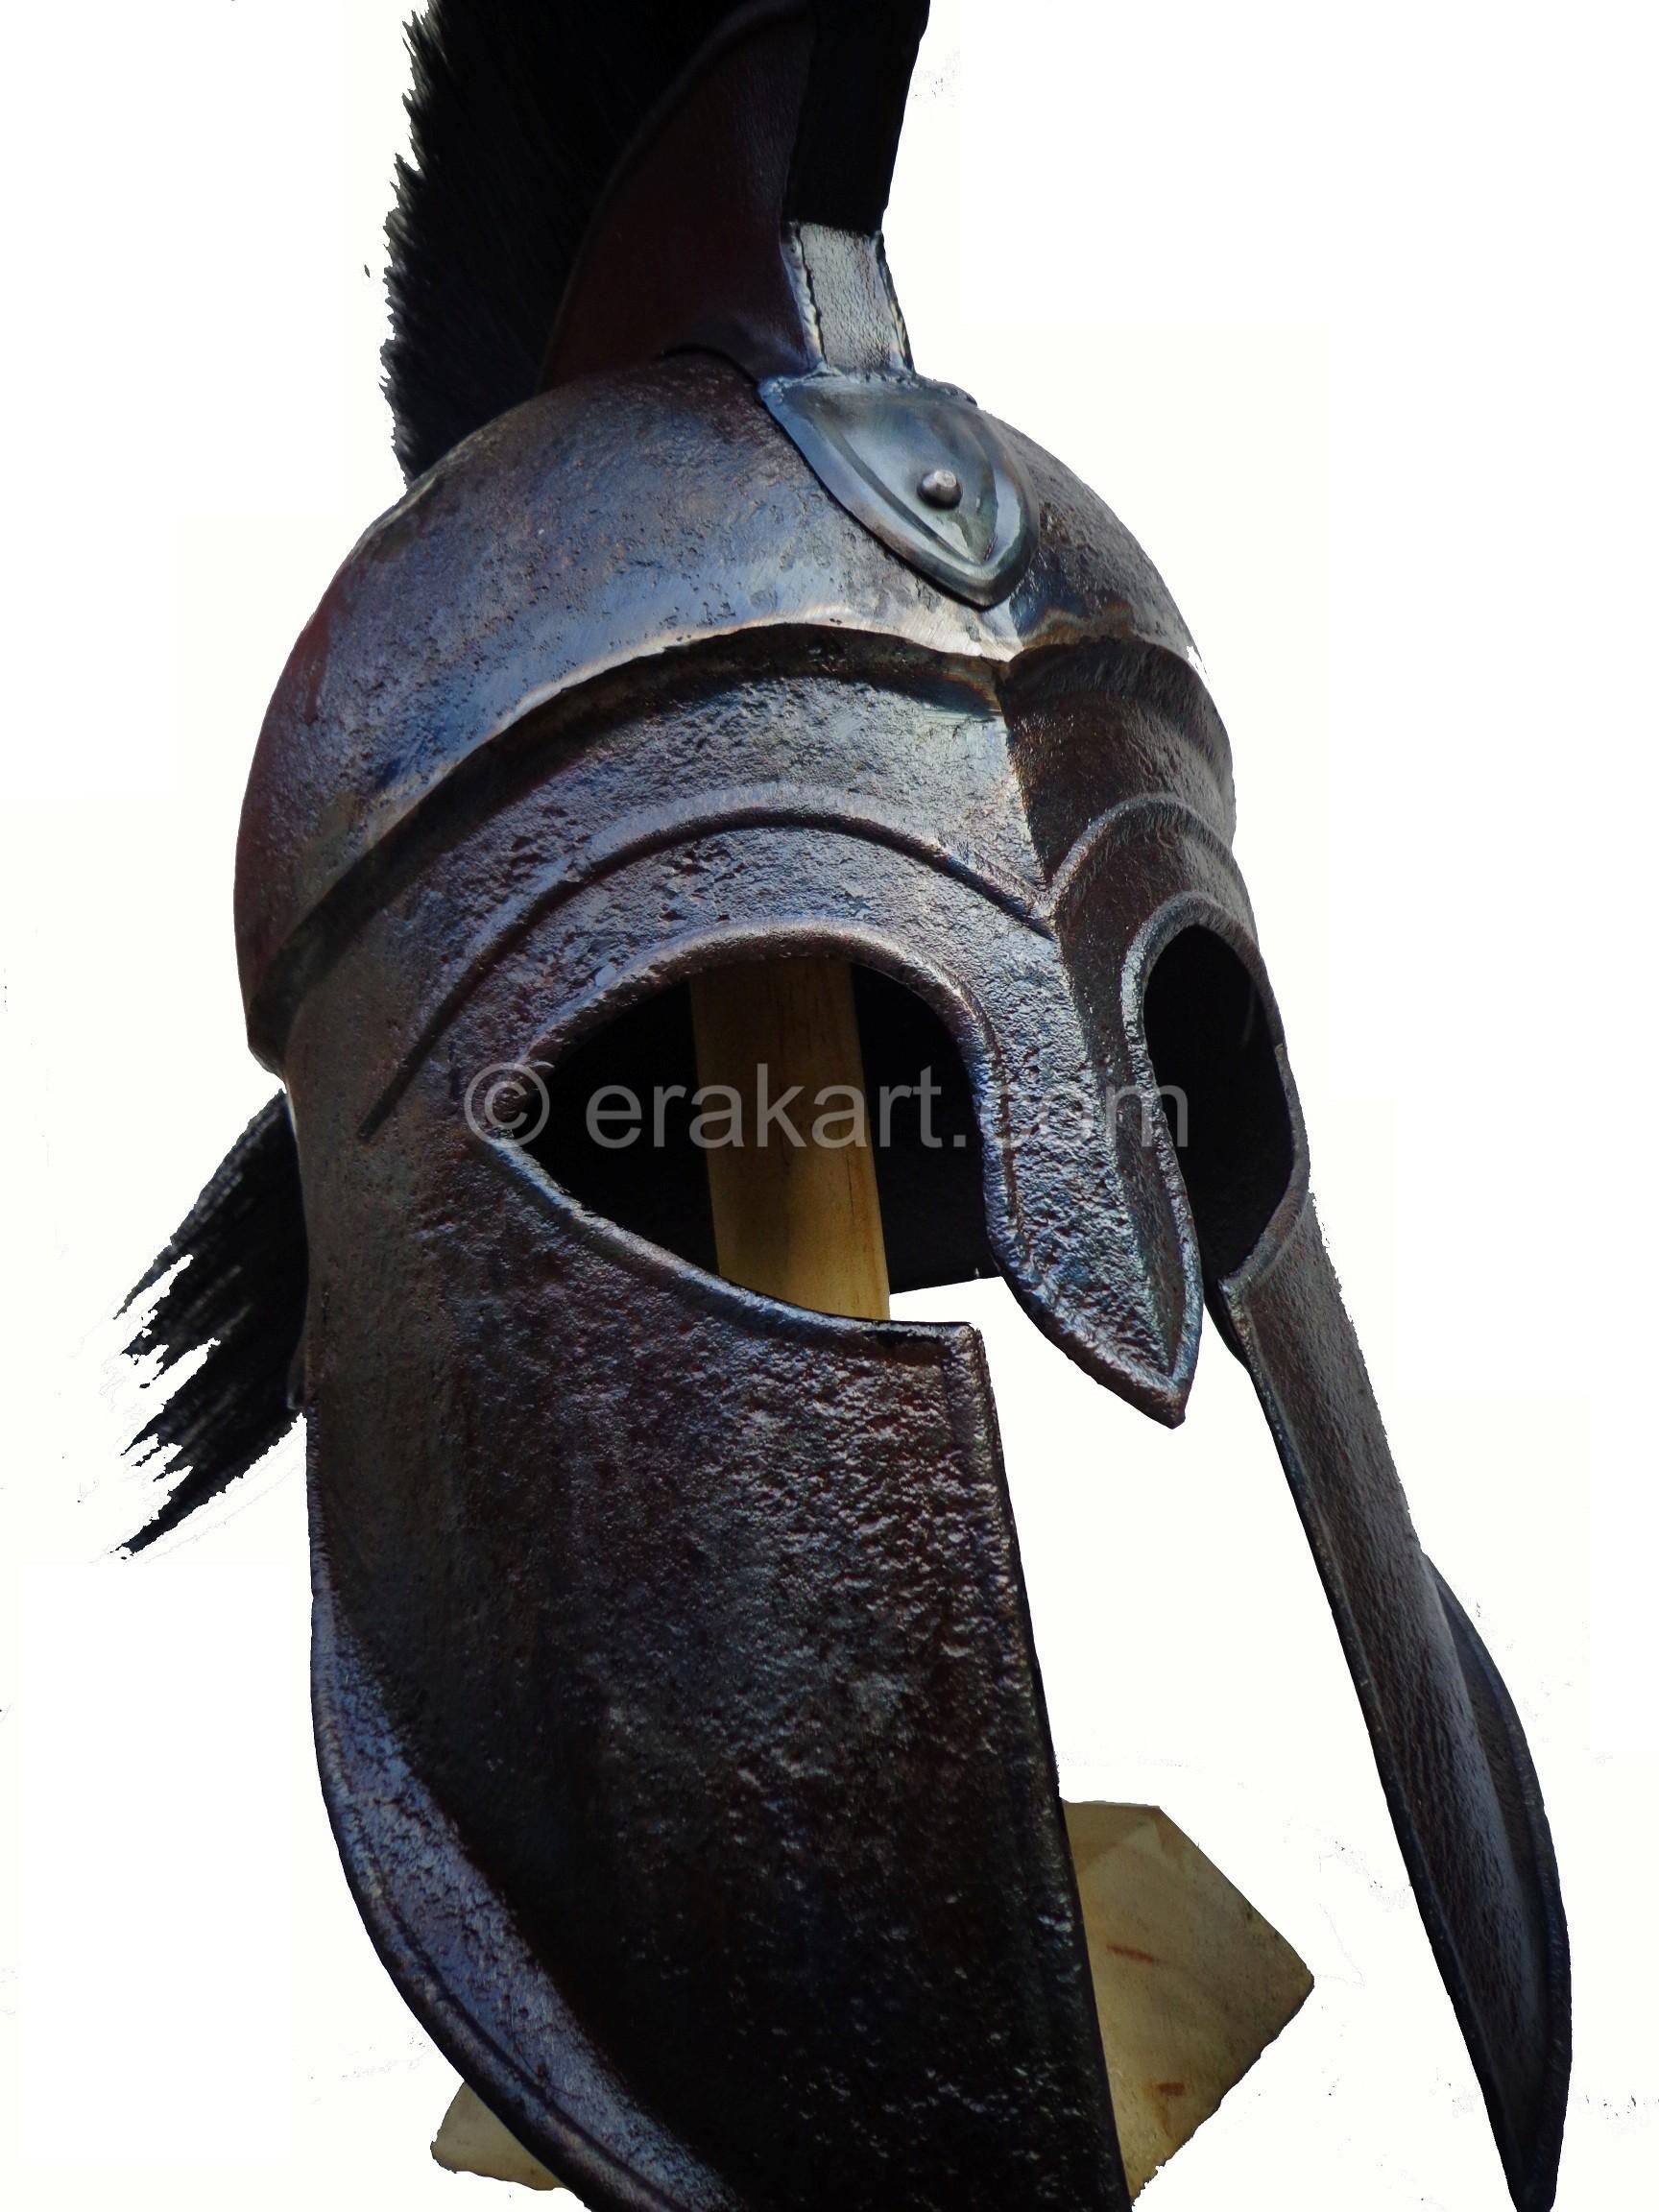 Greek Corinthian Helmet Medieval Armour Helmets On Sale